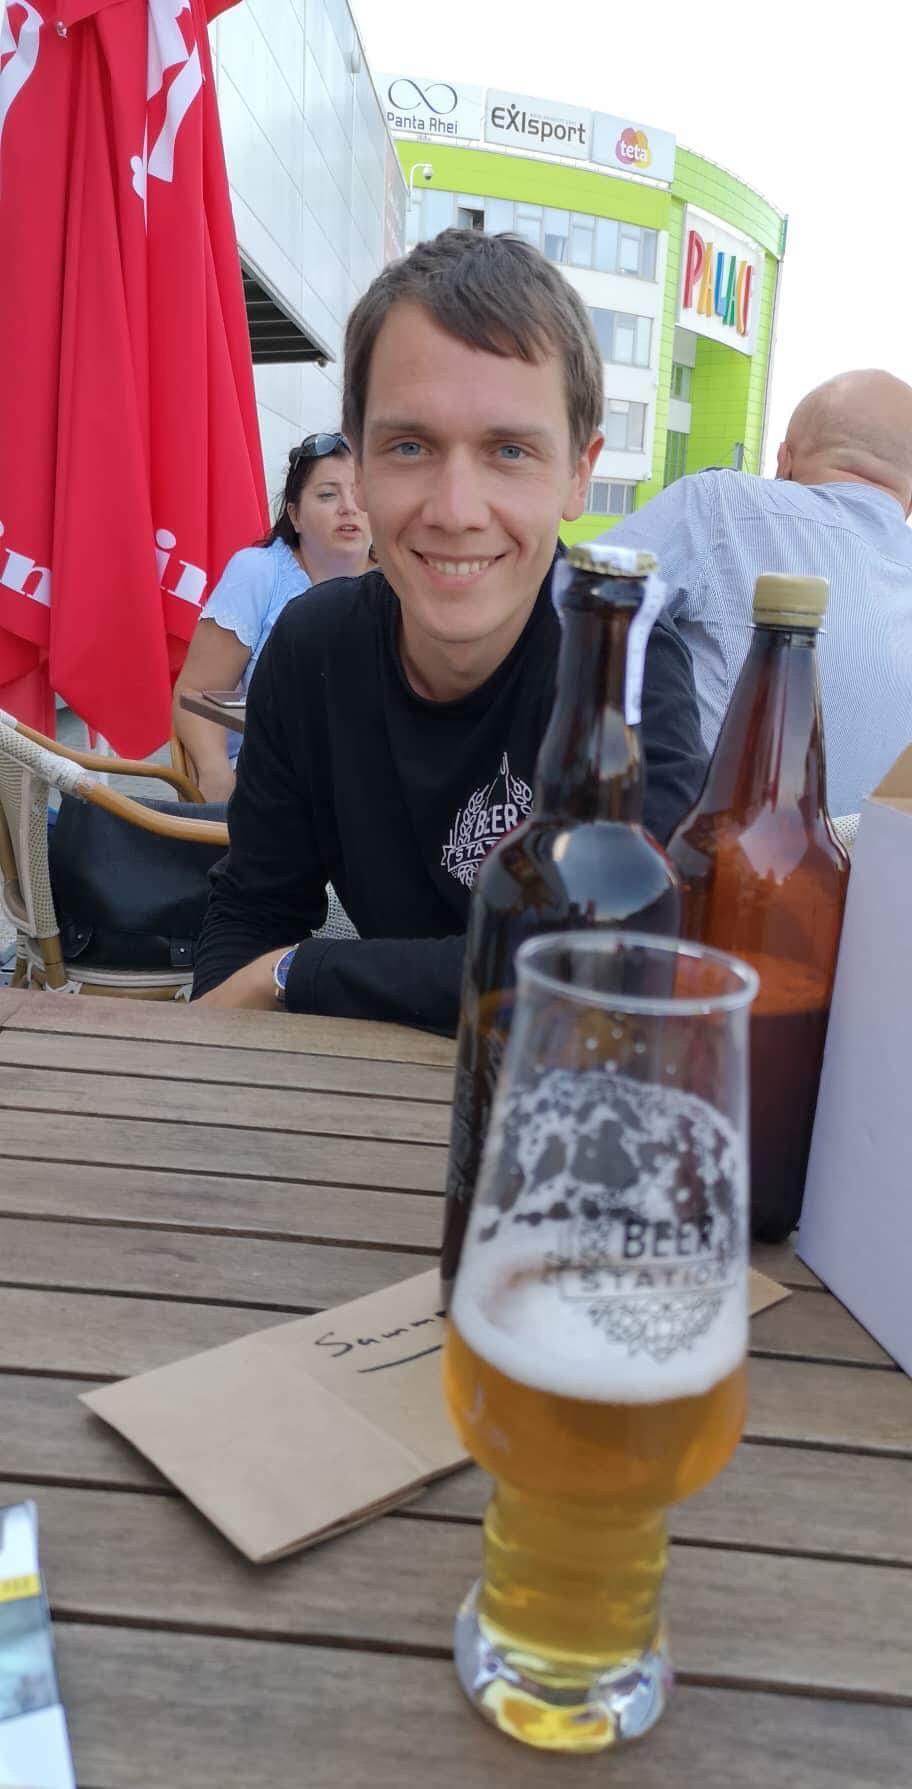 Majiteľ Beer Station, Artem